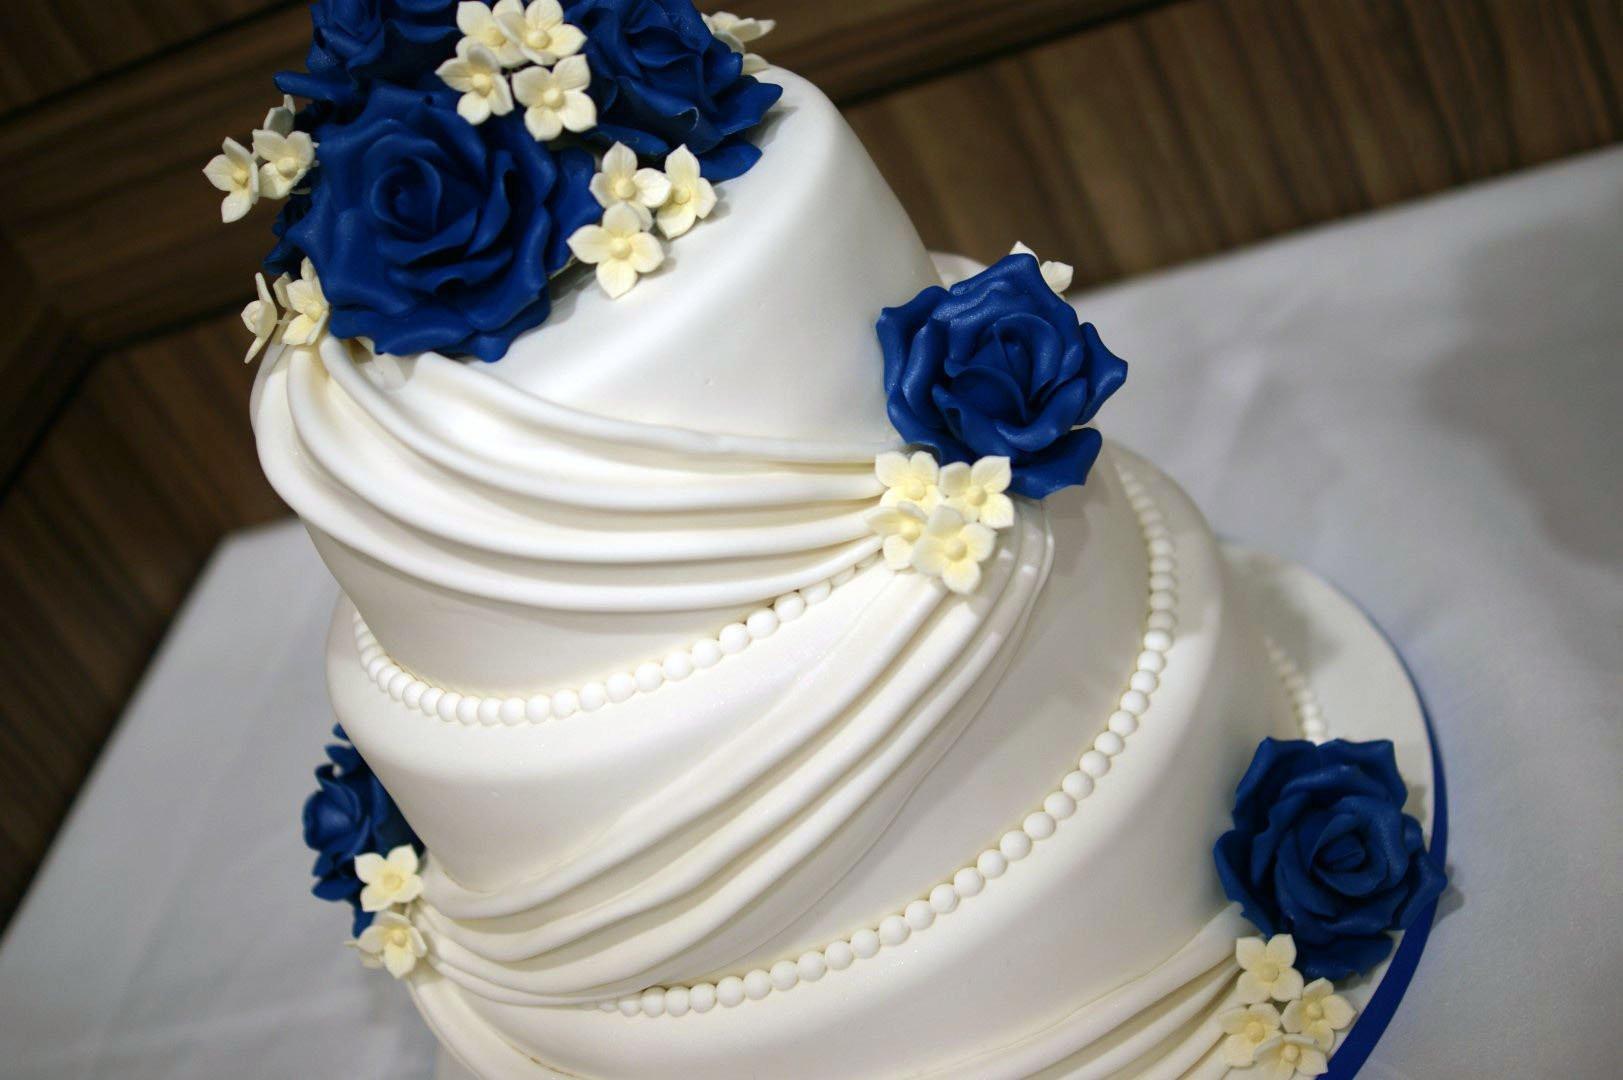 Wedding Cakes Three Tier  Three tier wedding cake recipe idea in 2017